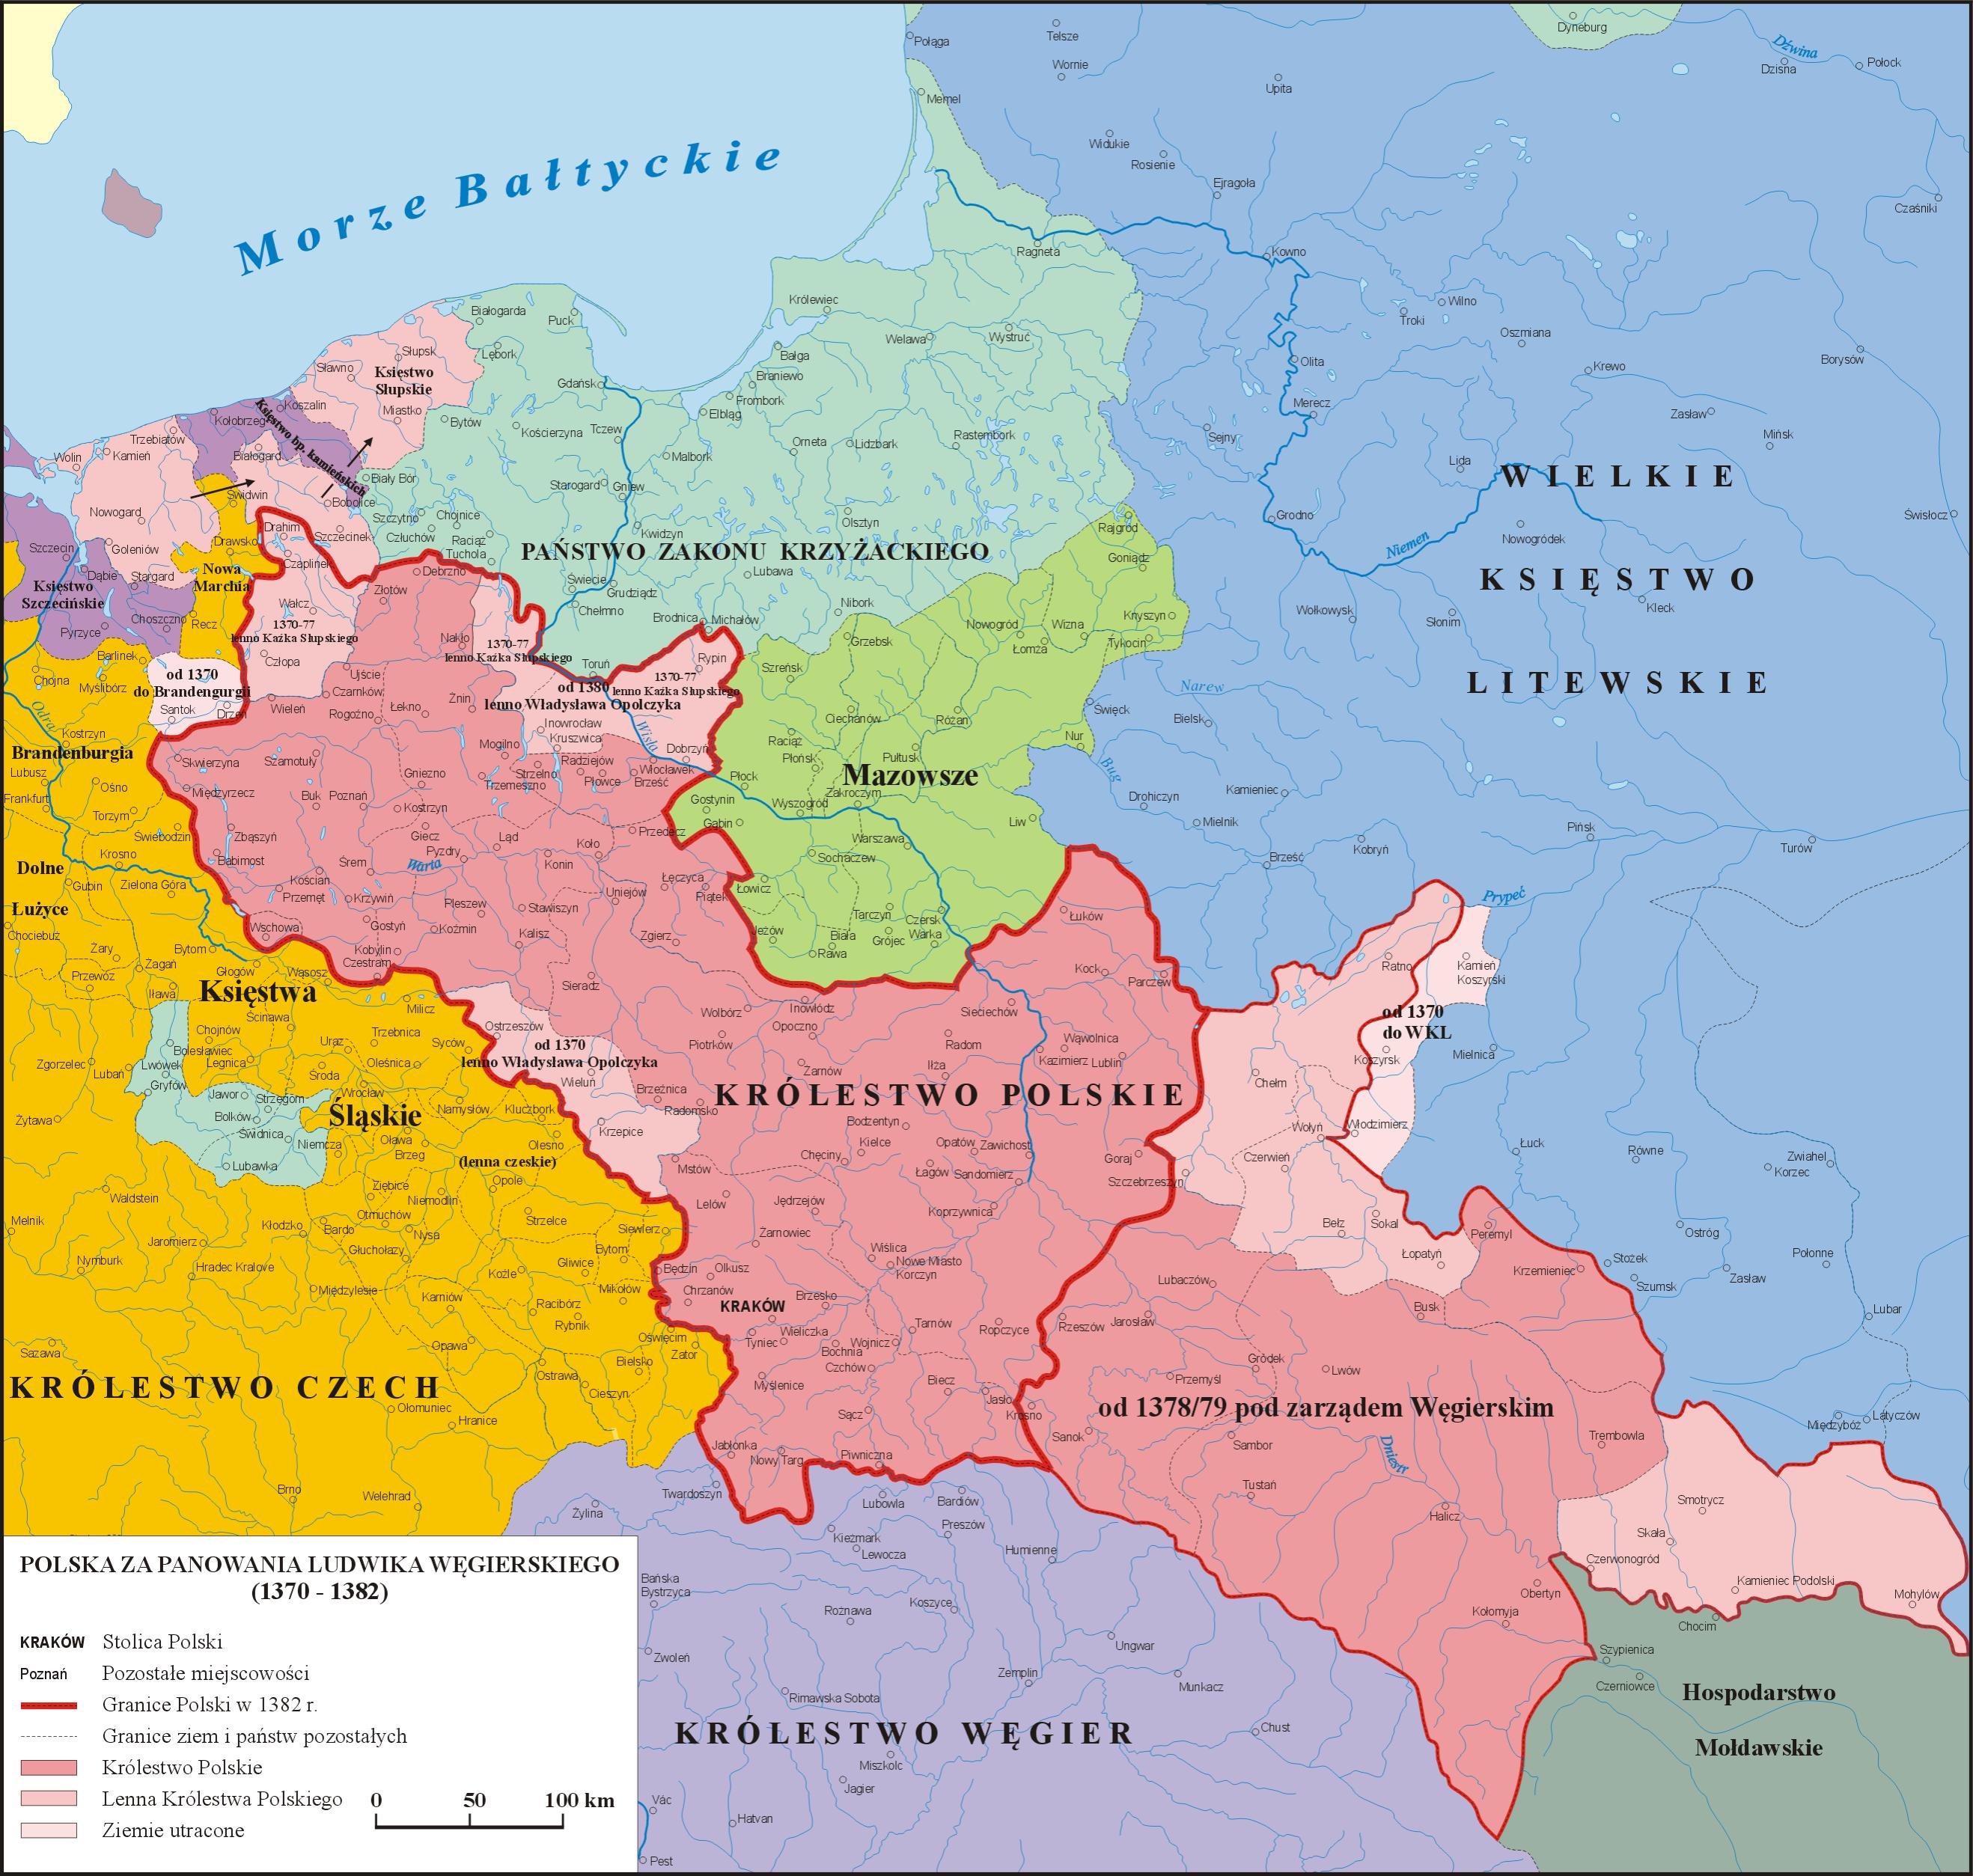 File:Polska 1370 - 1382.png